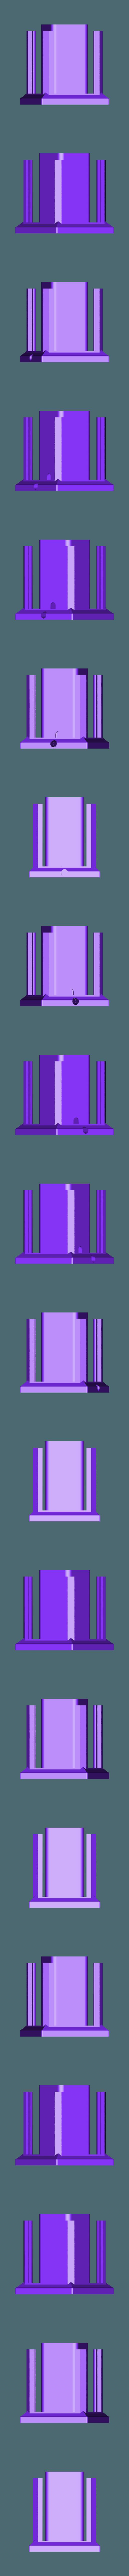 Base.STL Download free STL file Lithophane Light Box Desktop Organizer Pencil • 3D print object, HoytDesign